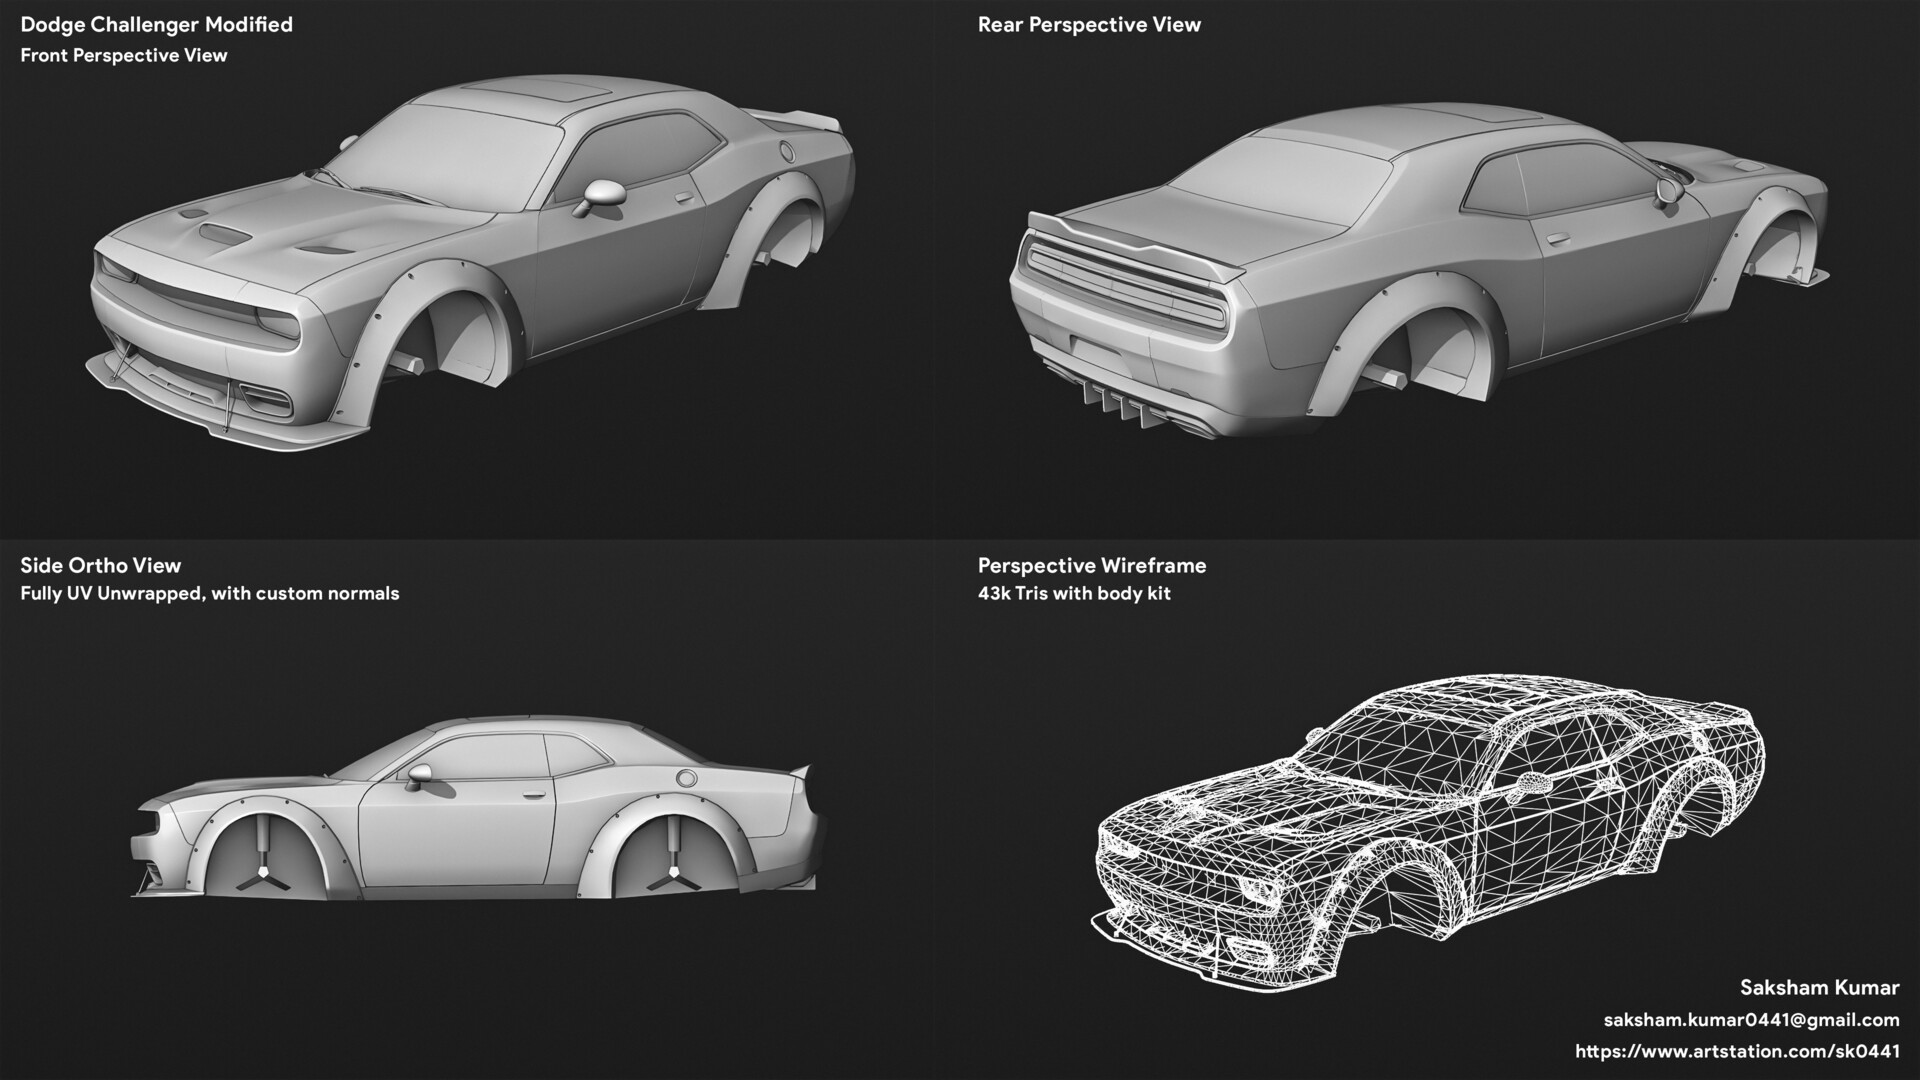 Dodge Challender Modified (43k tris)